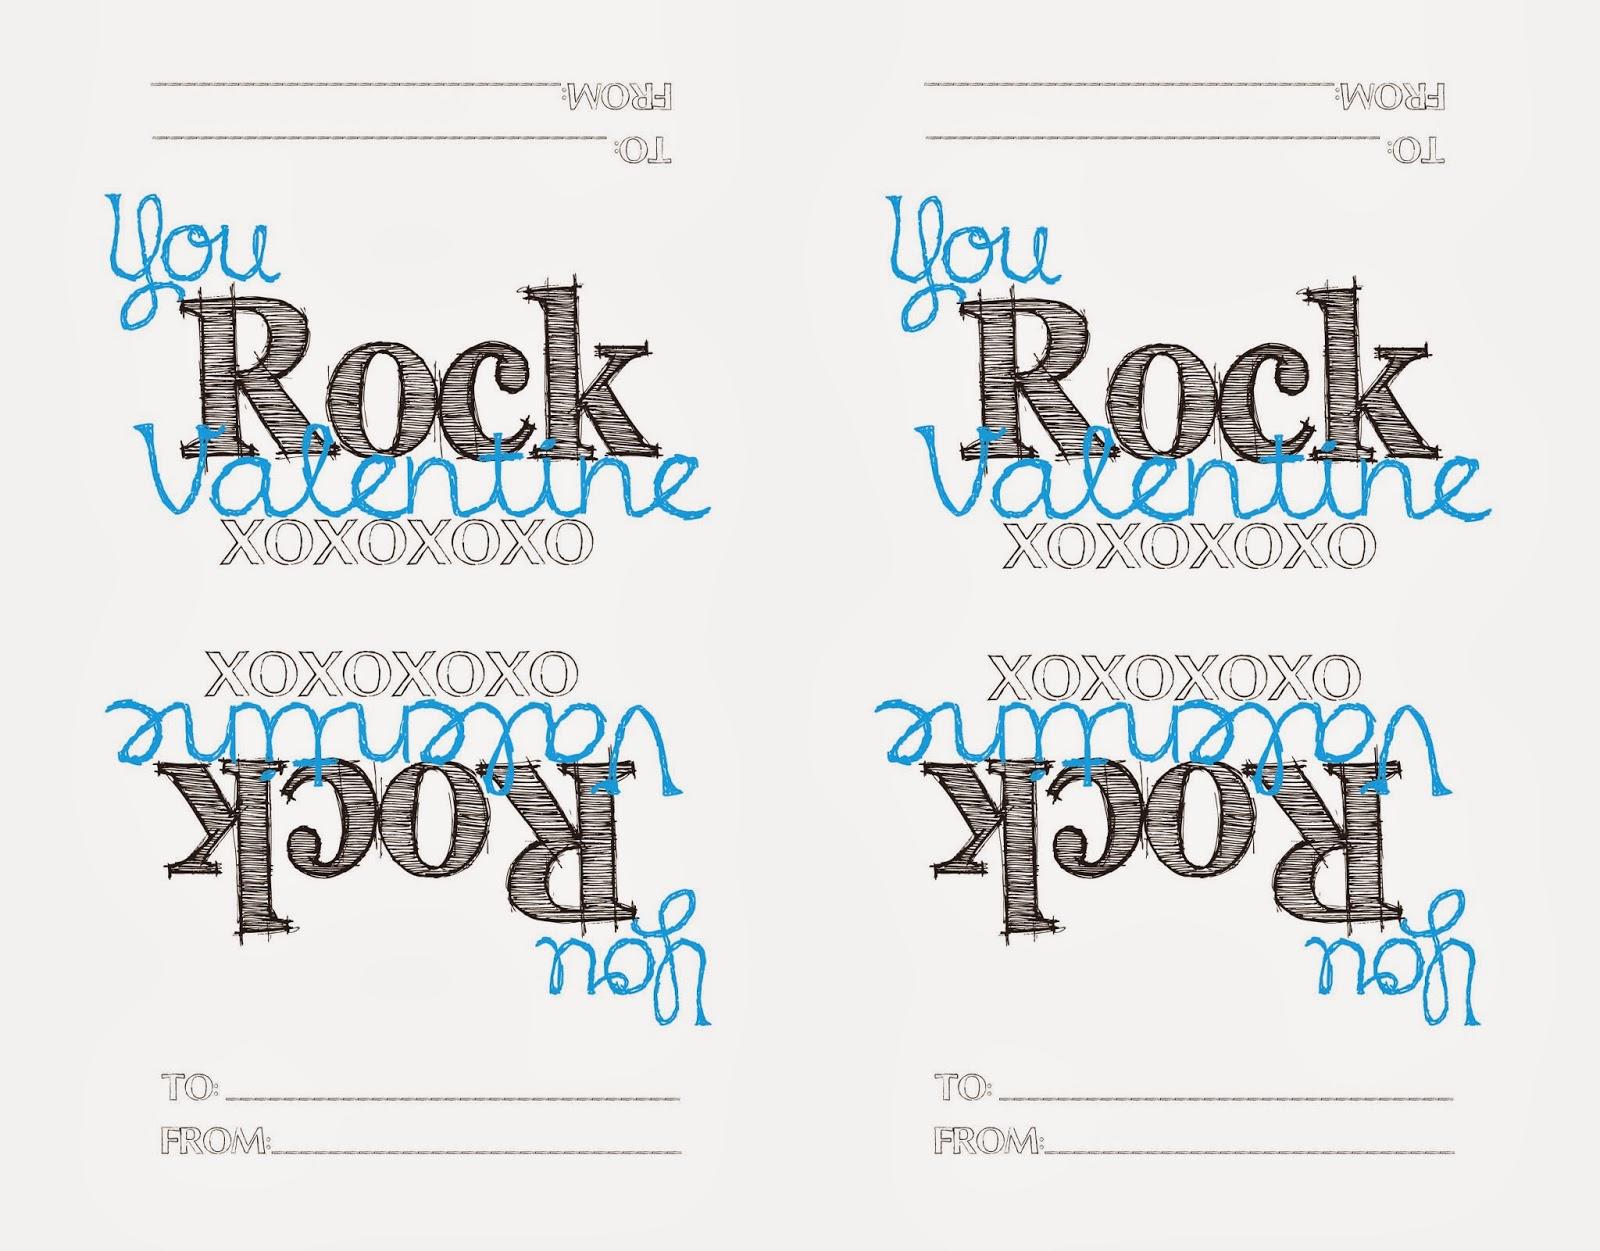 image relating to You Rock Valentine Printable identified as Up-Cycled Printable Treasures: Printable Valentine - POP Rocks